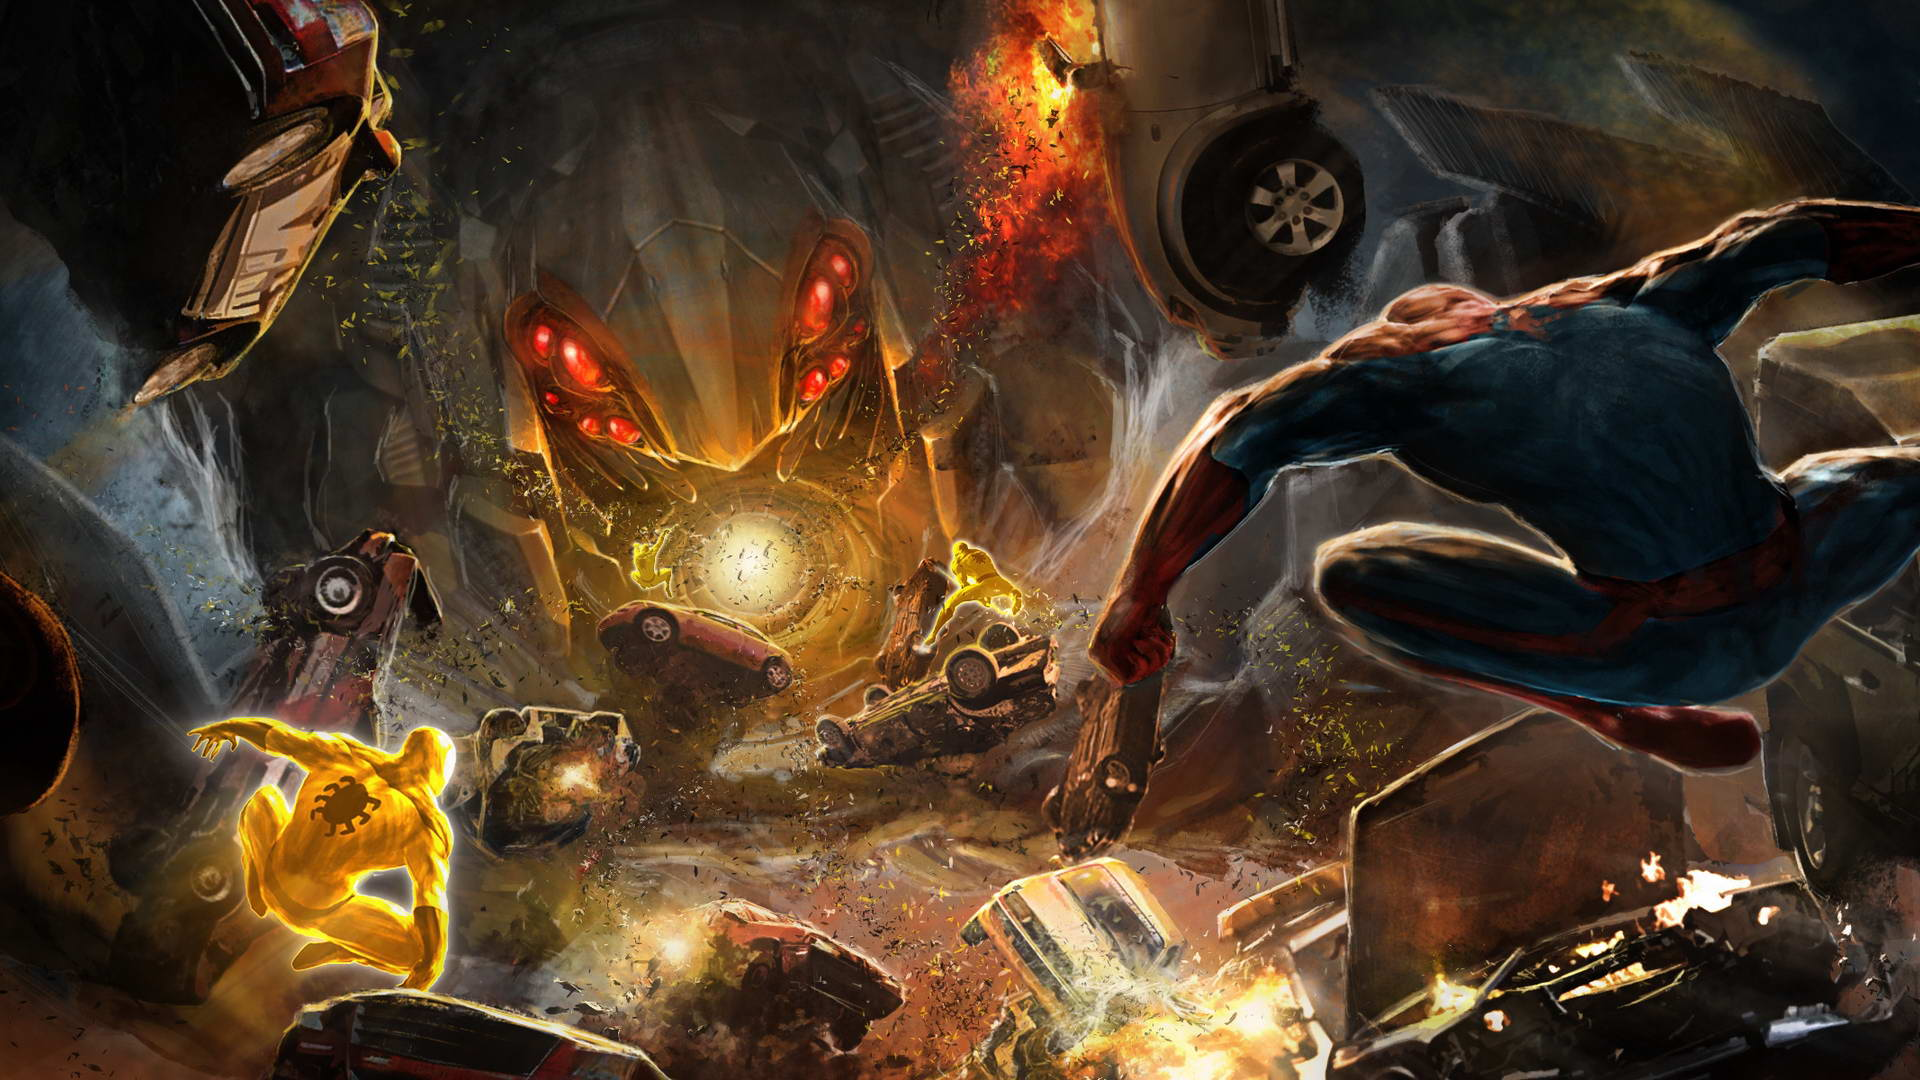 Арт Amazing Spider-Man: The Game